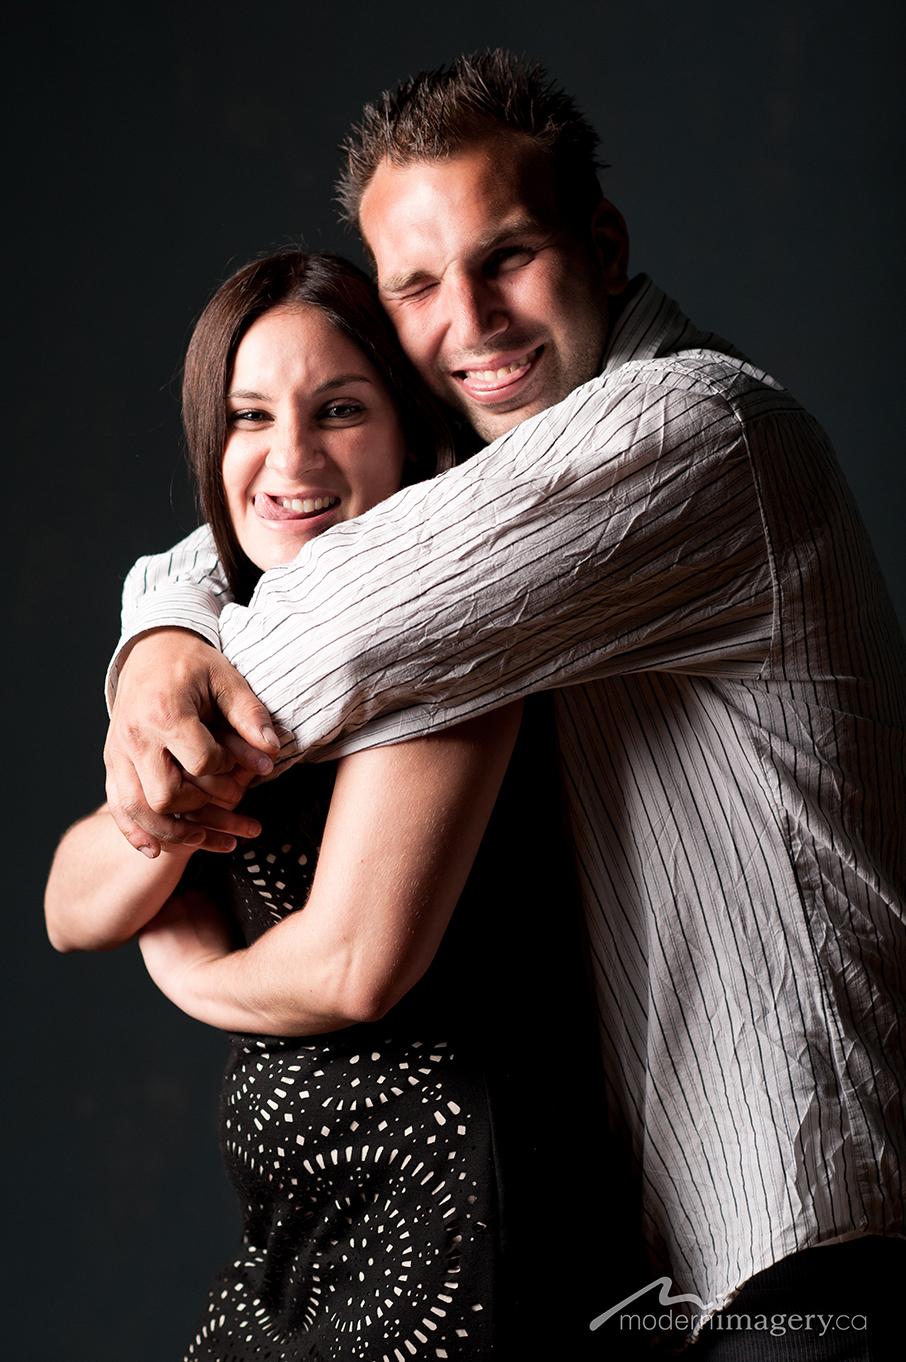 Rita&Tomasso-48.jpg